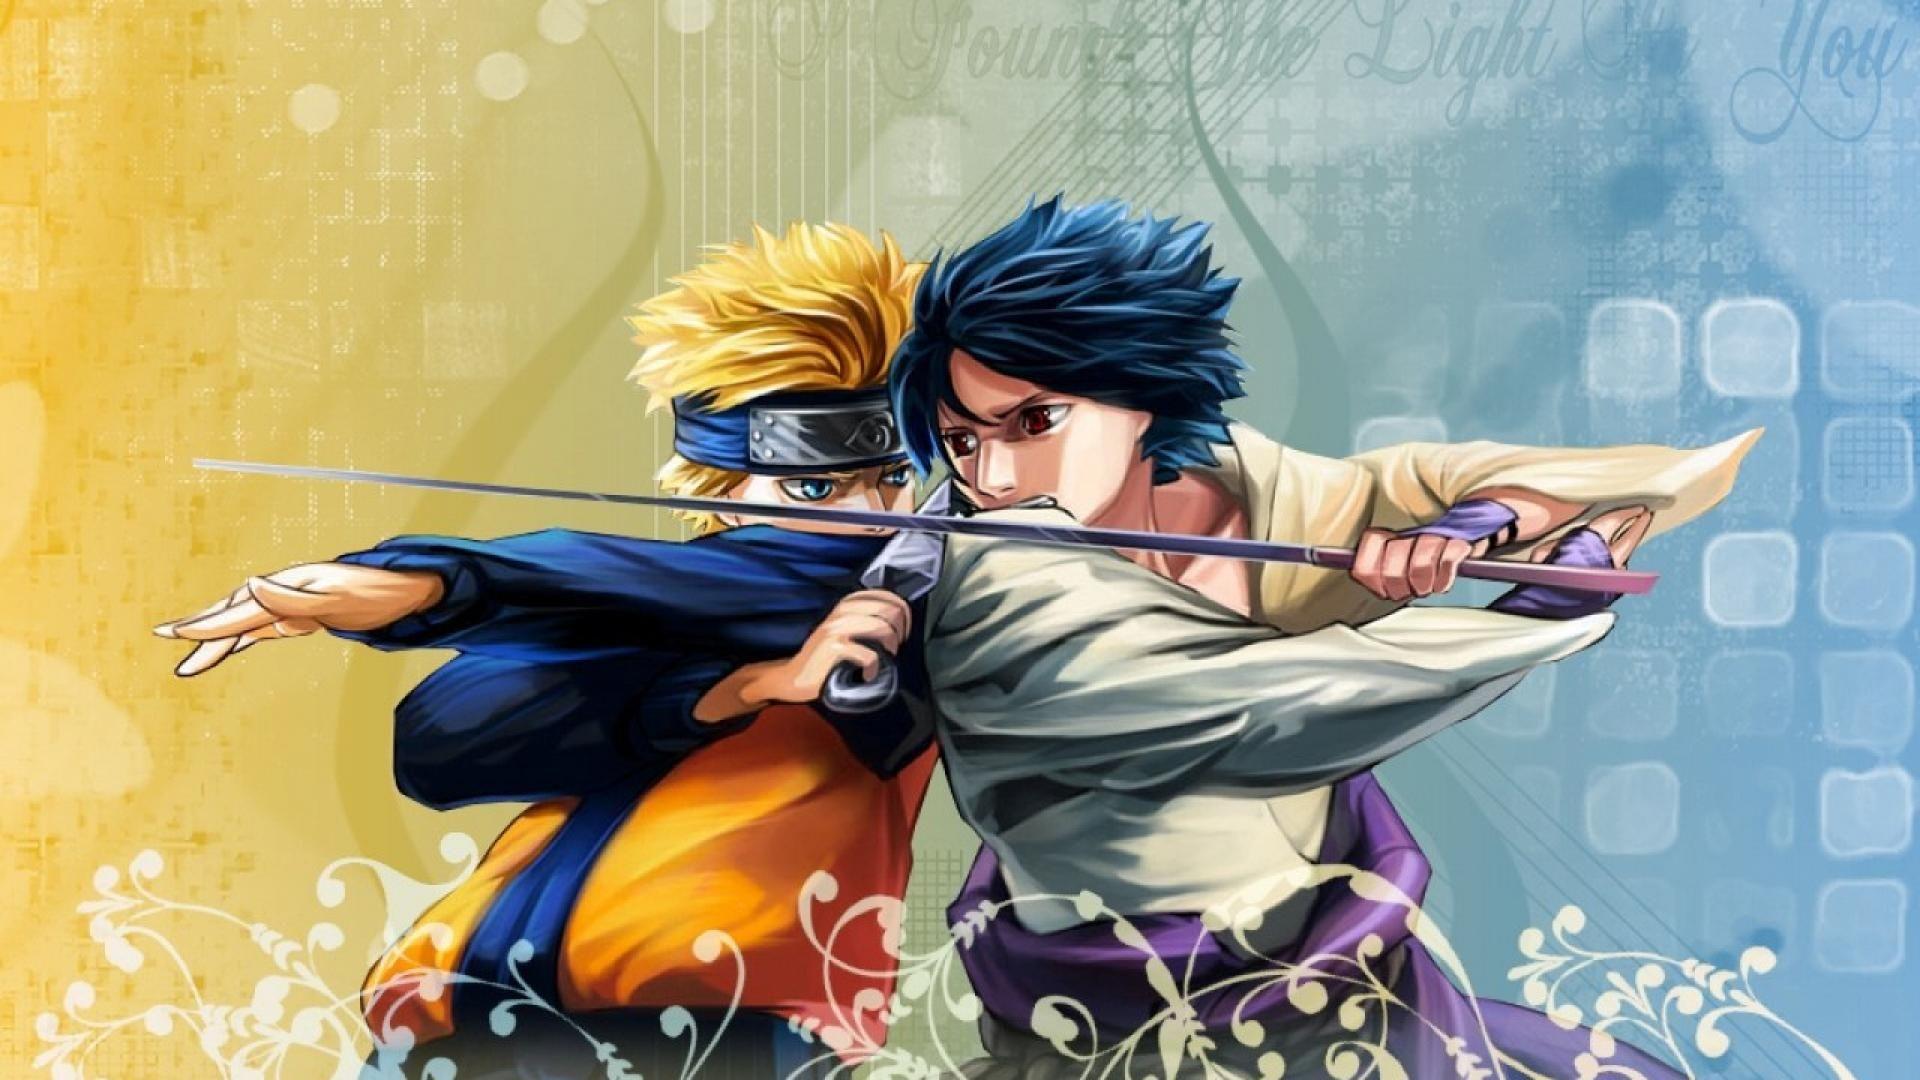 Naruto and Sasuke, Free Download Wallpaper